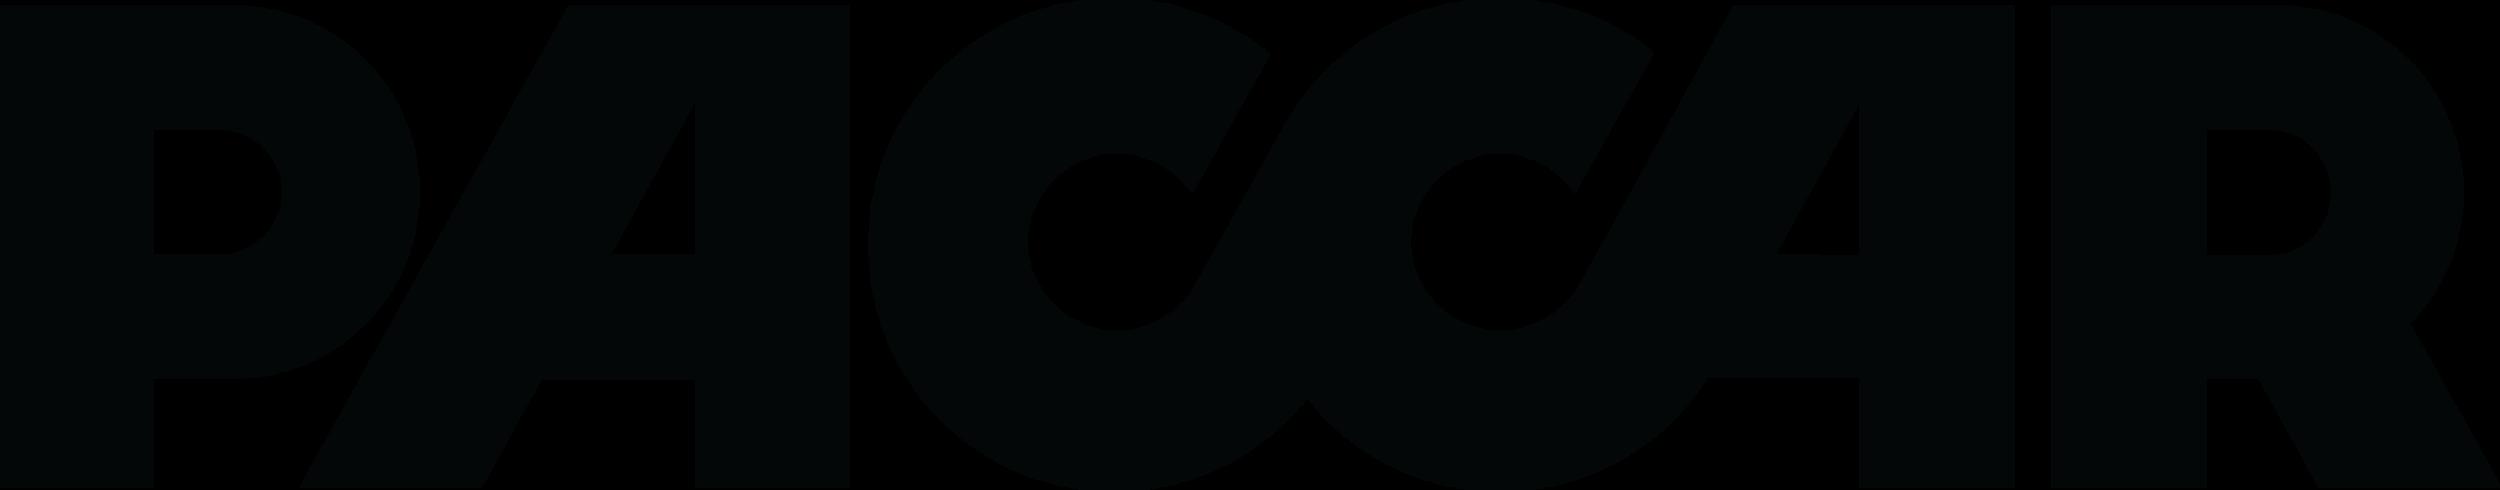 Logo-Paccar-Black.png